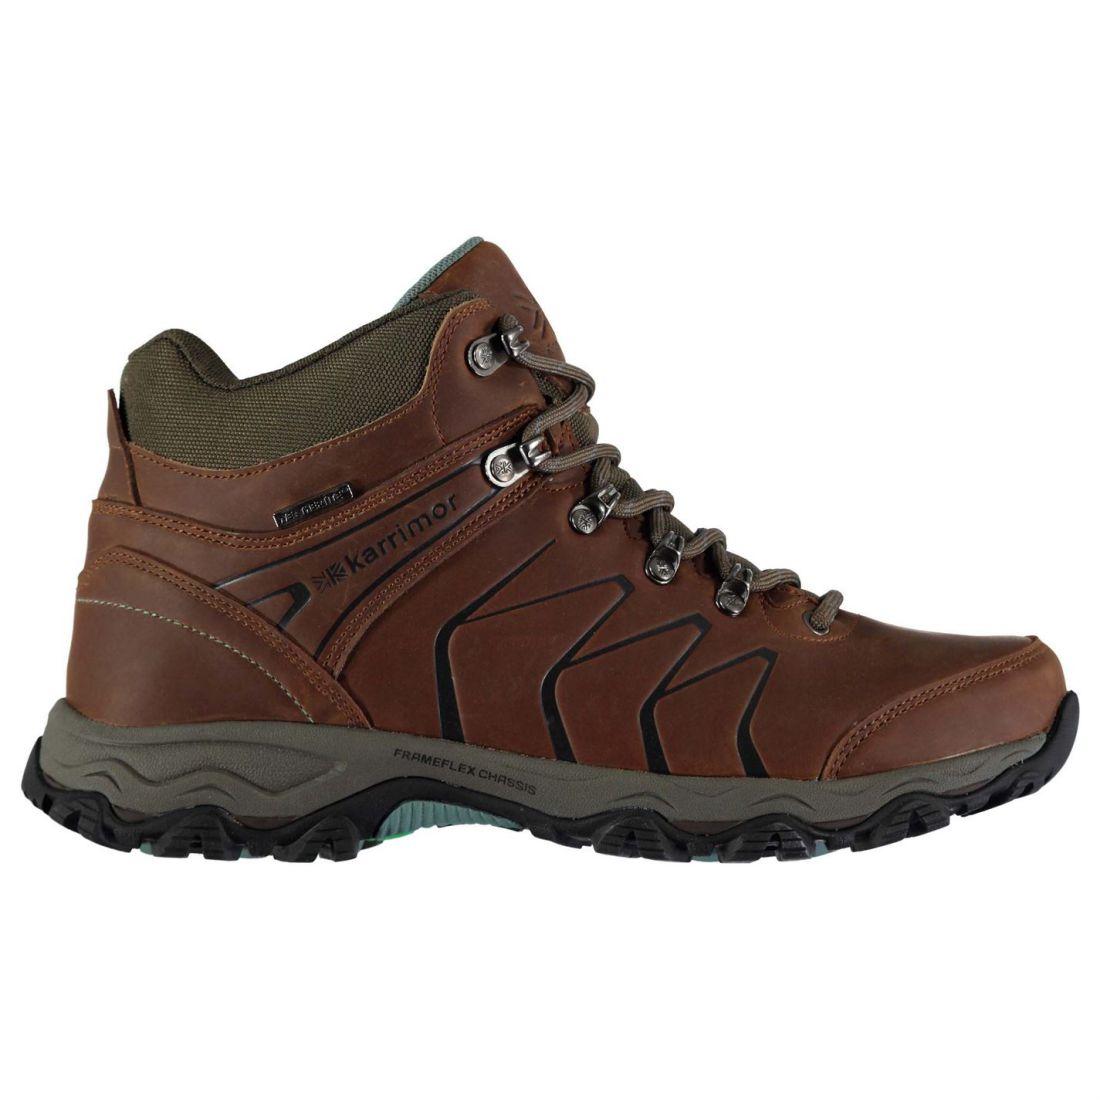 b5b68ed07b2 Karrimor Womens Dales Mid Waterproof Walking Boots Breathable ...